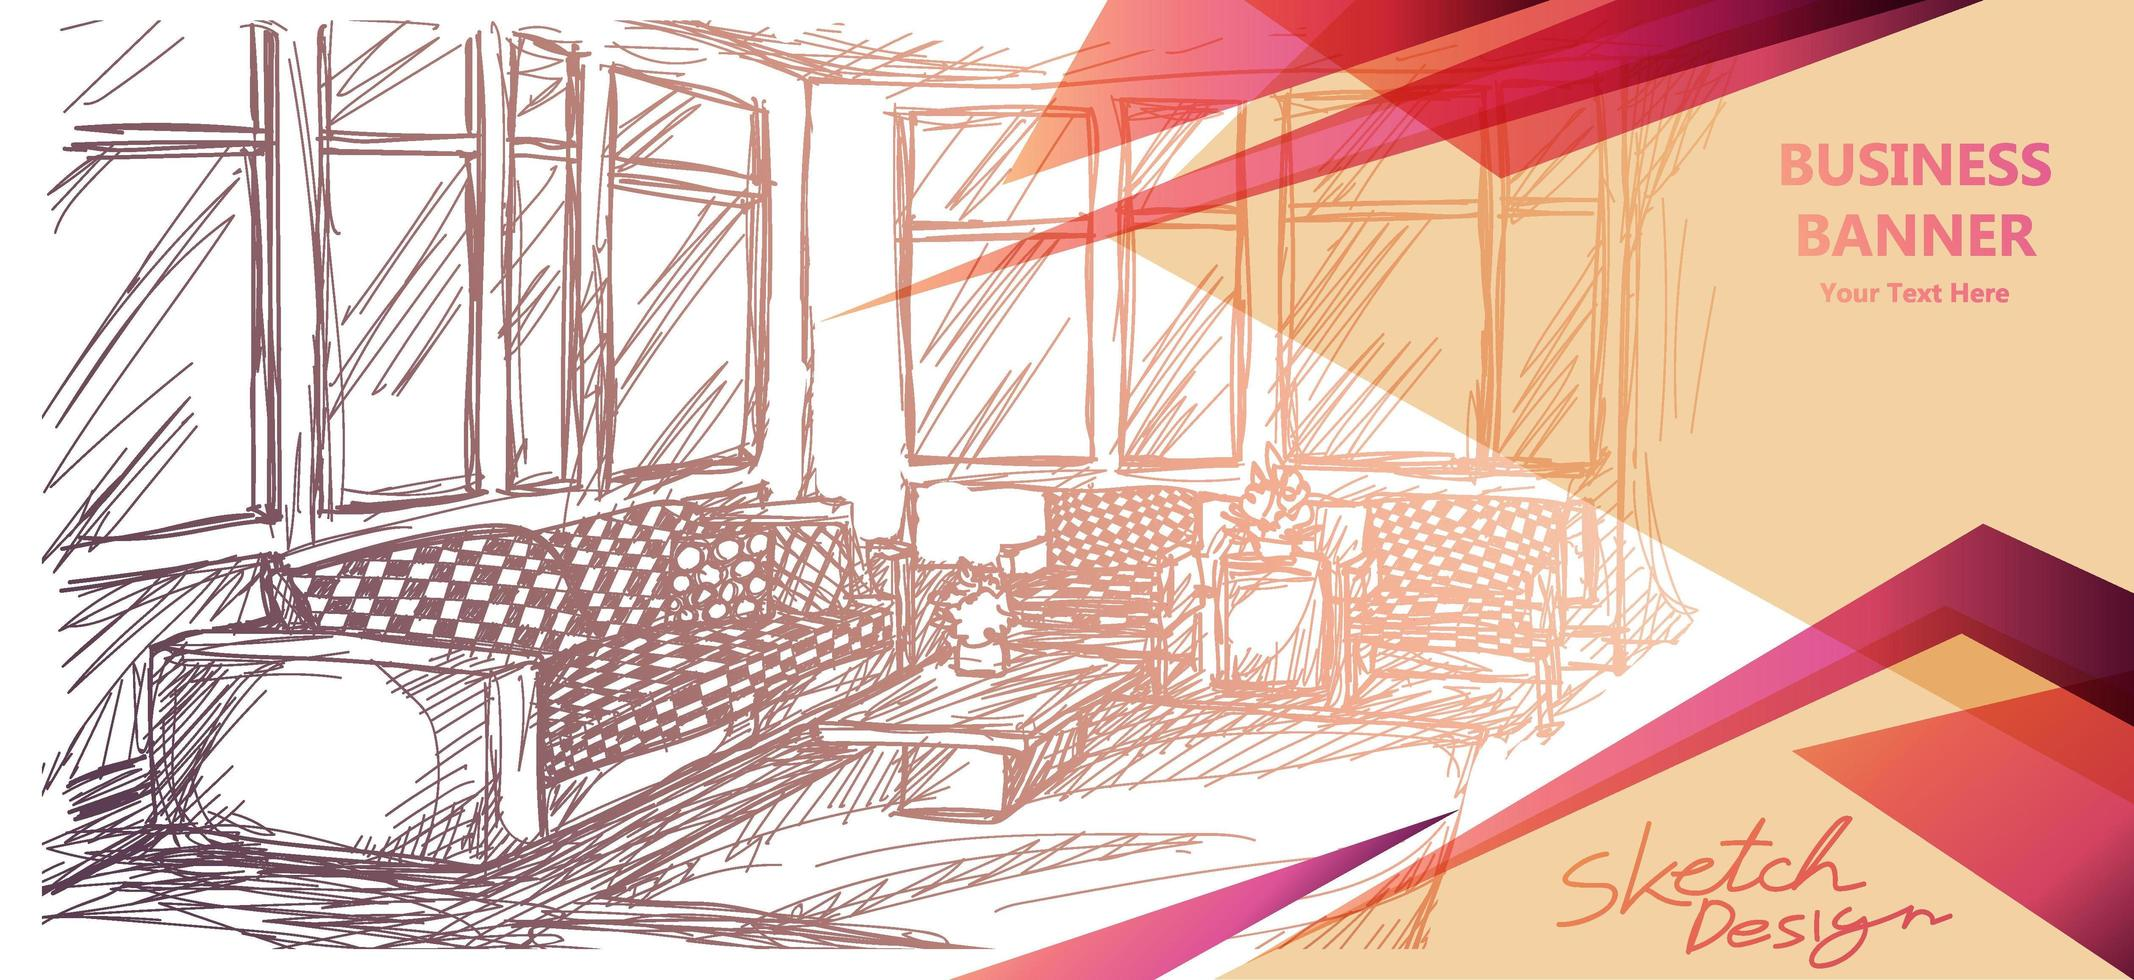 interieur kamer schets bannerontwerp vector